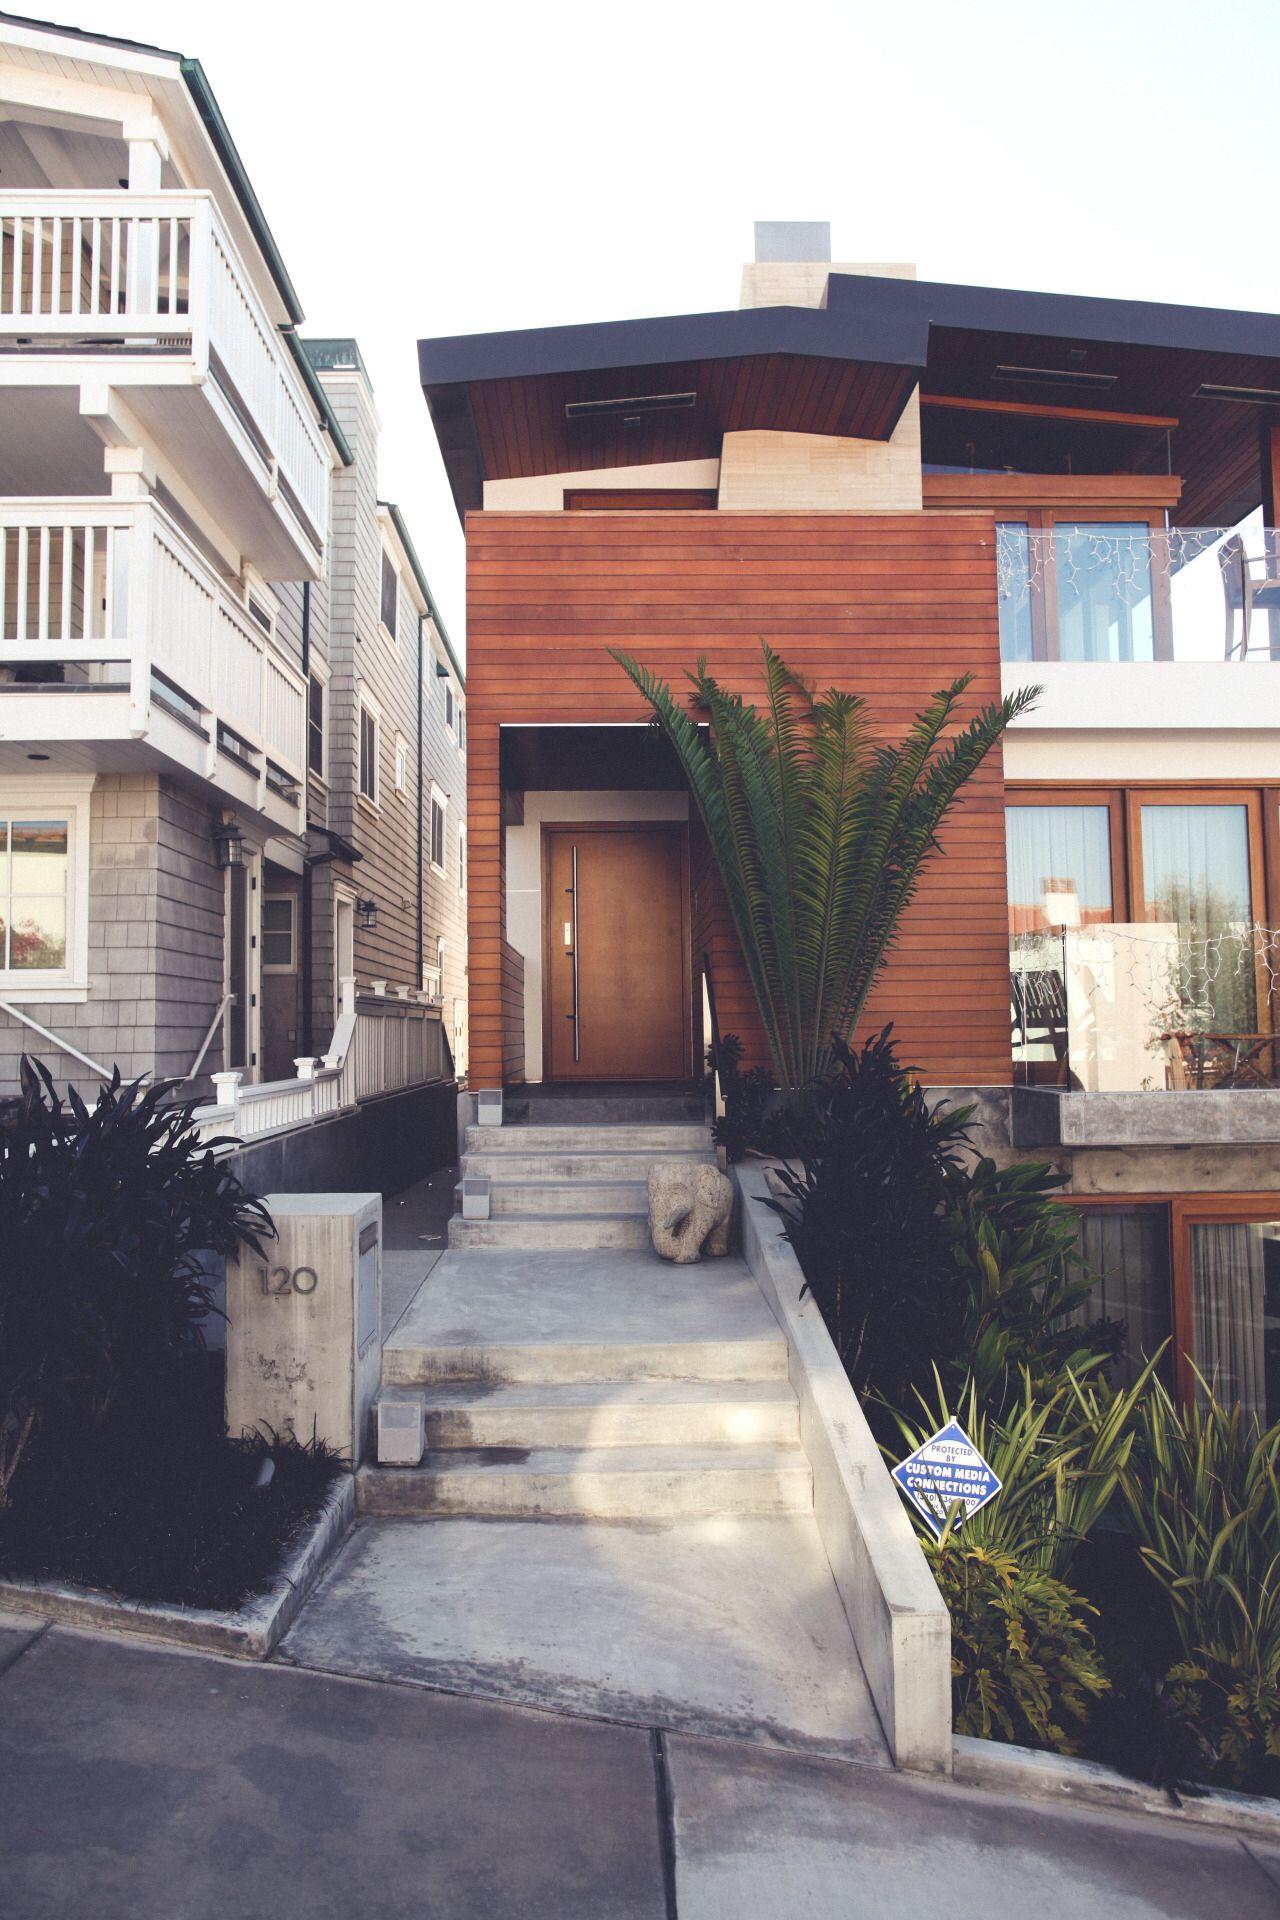 Modern Luxury Wood Design Architecture Design Dream Homes Luxury Fashion Landscape Interiors Public Domain Urban Outfitters